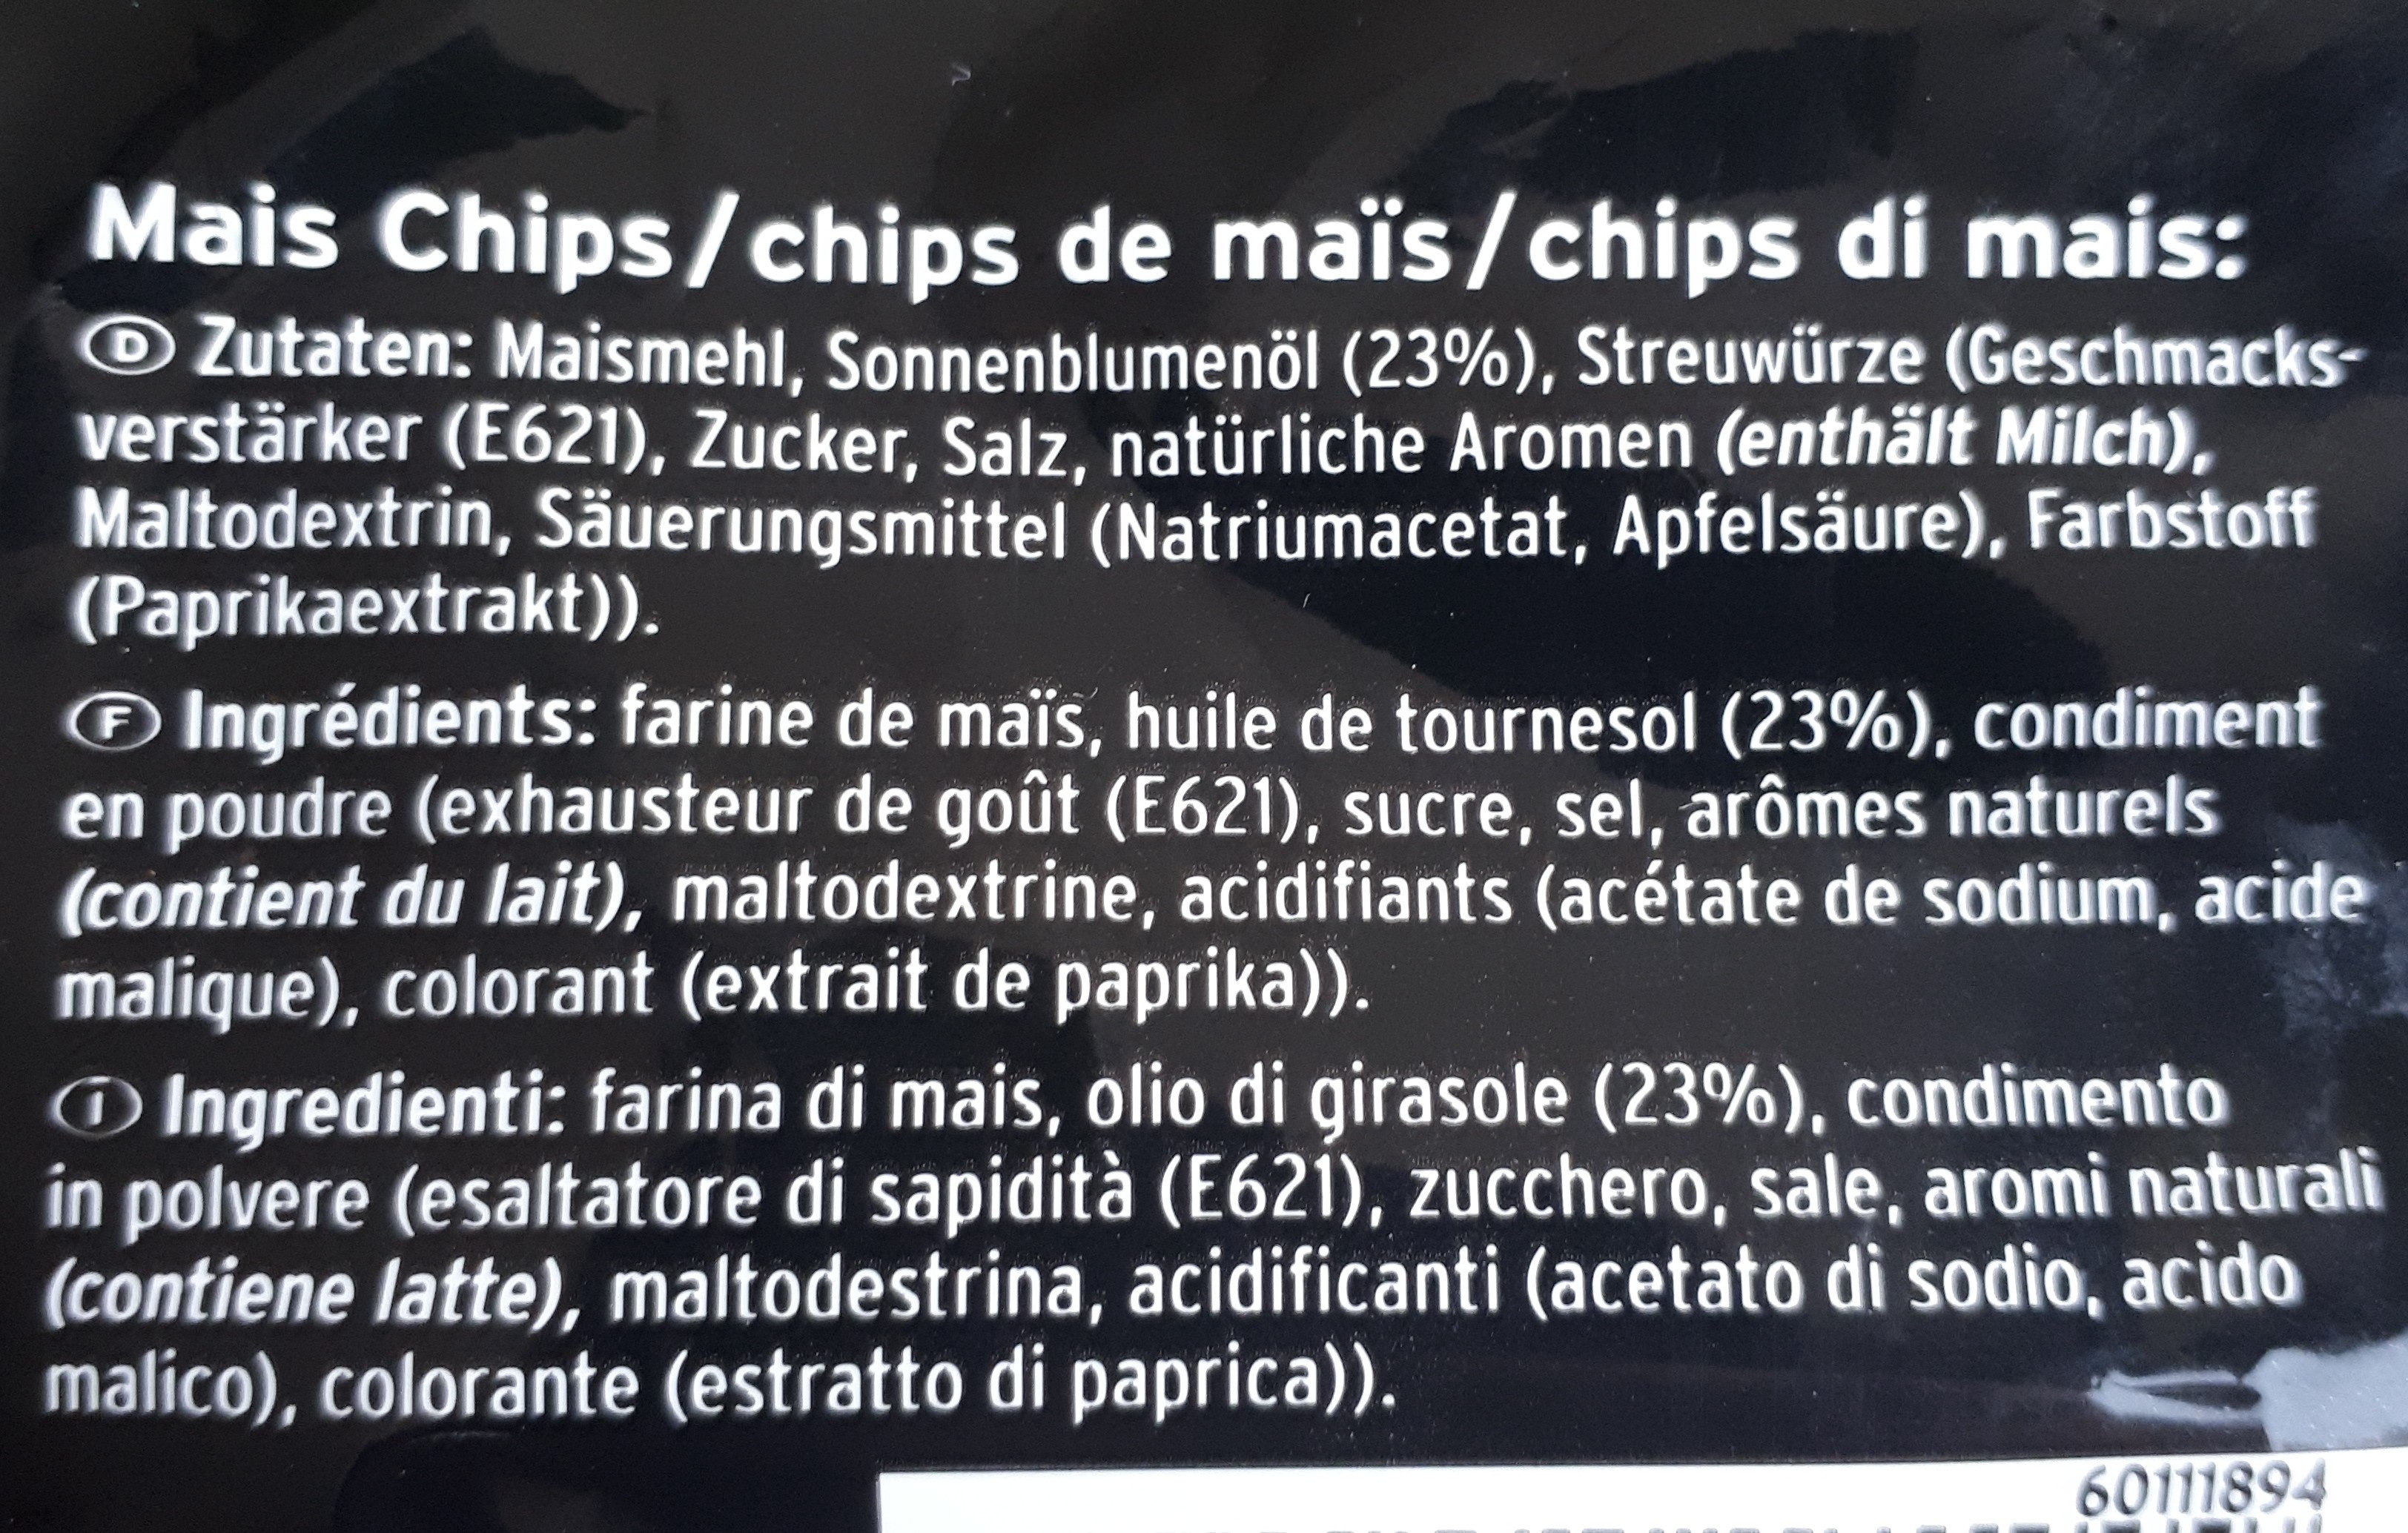 Corn Chips Original - Zutaten